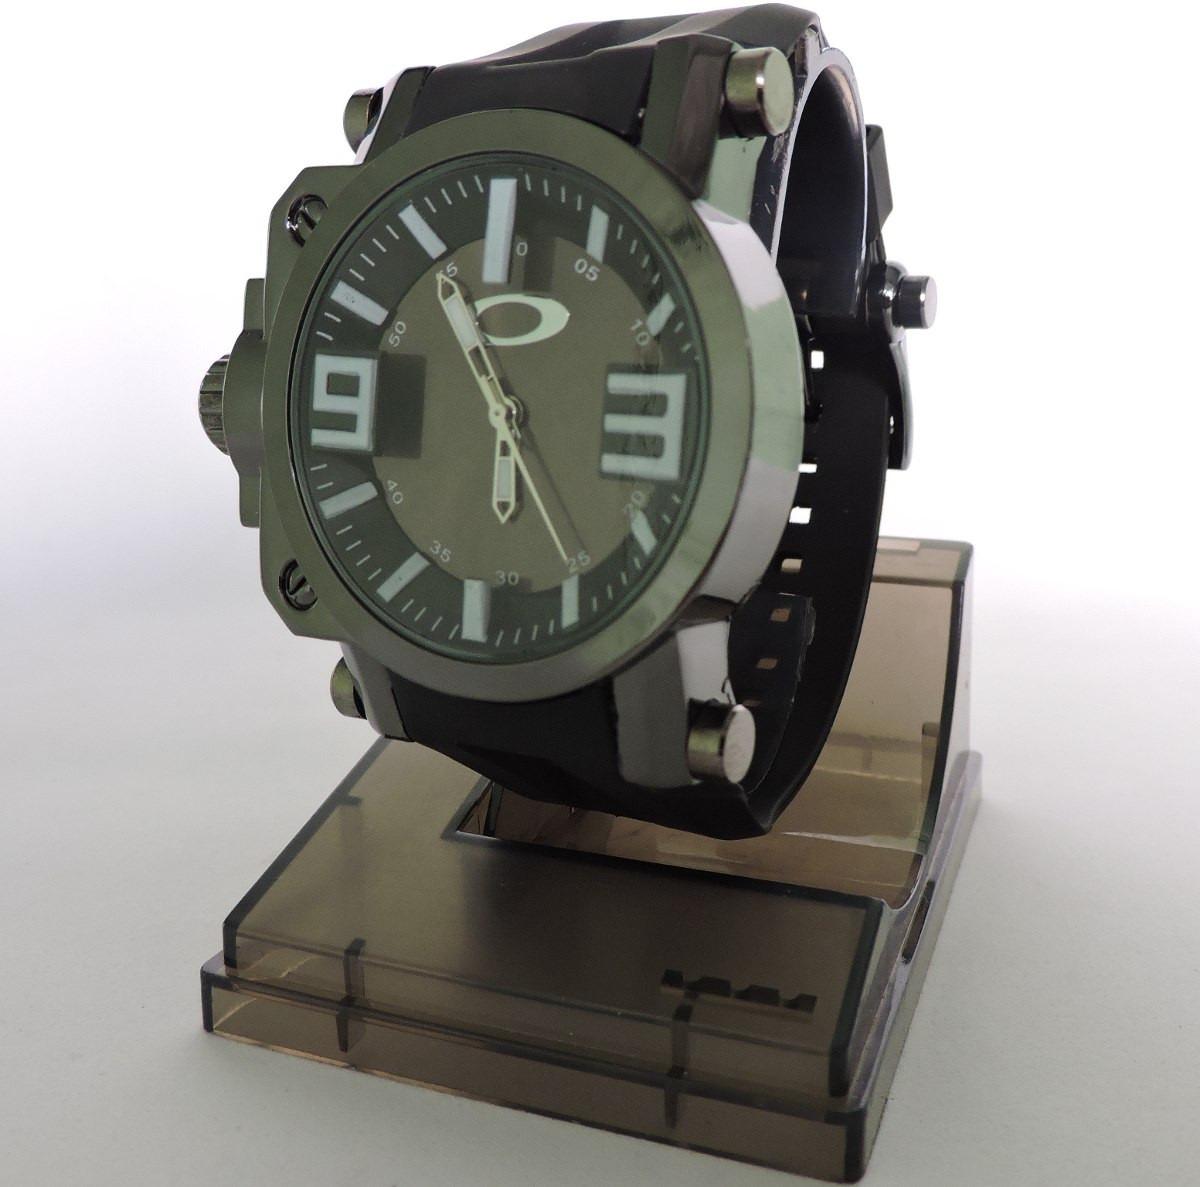 17c20fe3100 relógio masculino oakley gearbox esporte preto. Carregando zoom... relógio  masculino oakley. Carregando zoom.